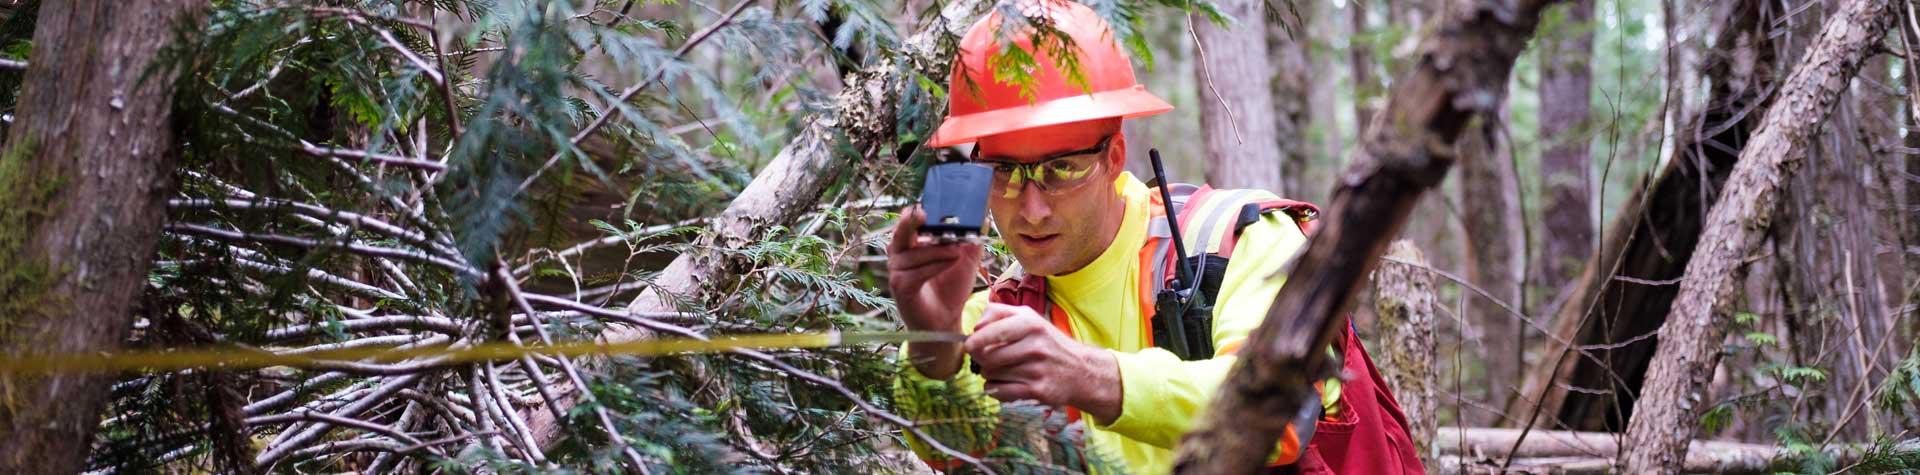 Banner Forest Measuring